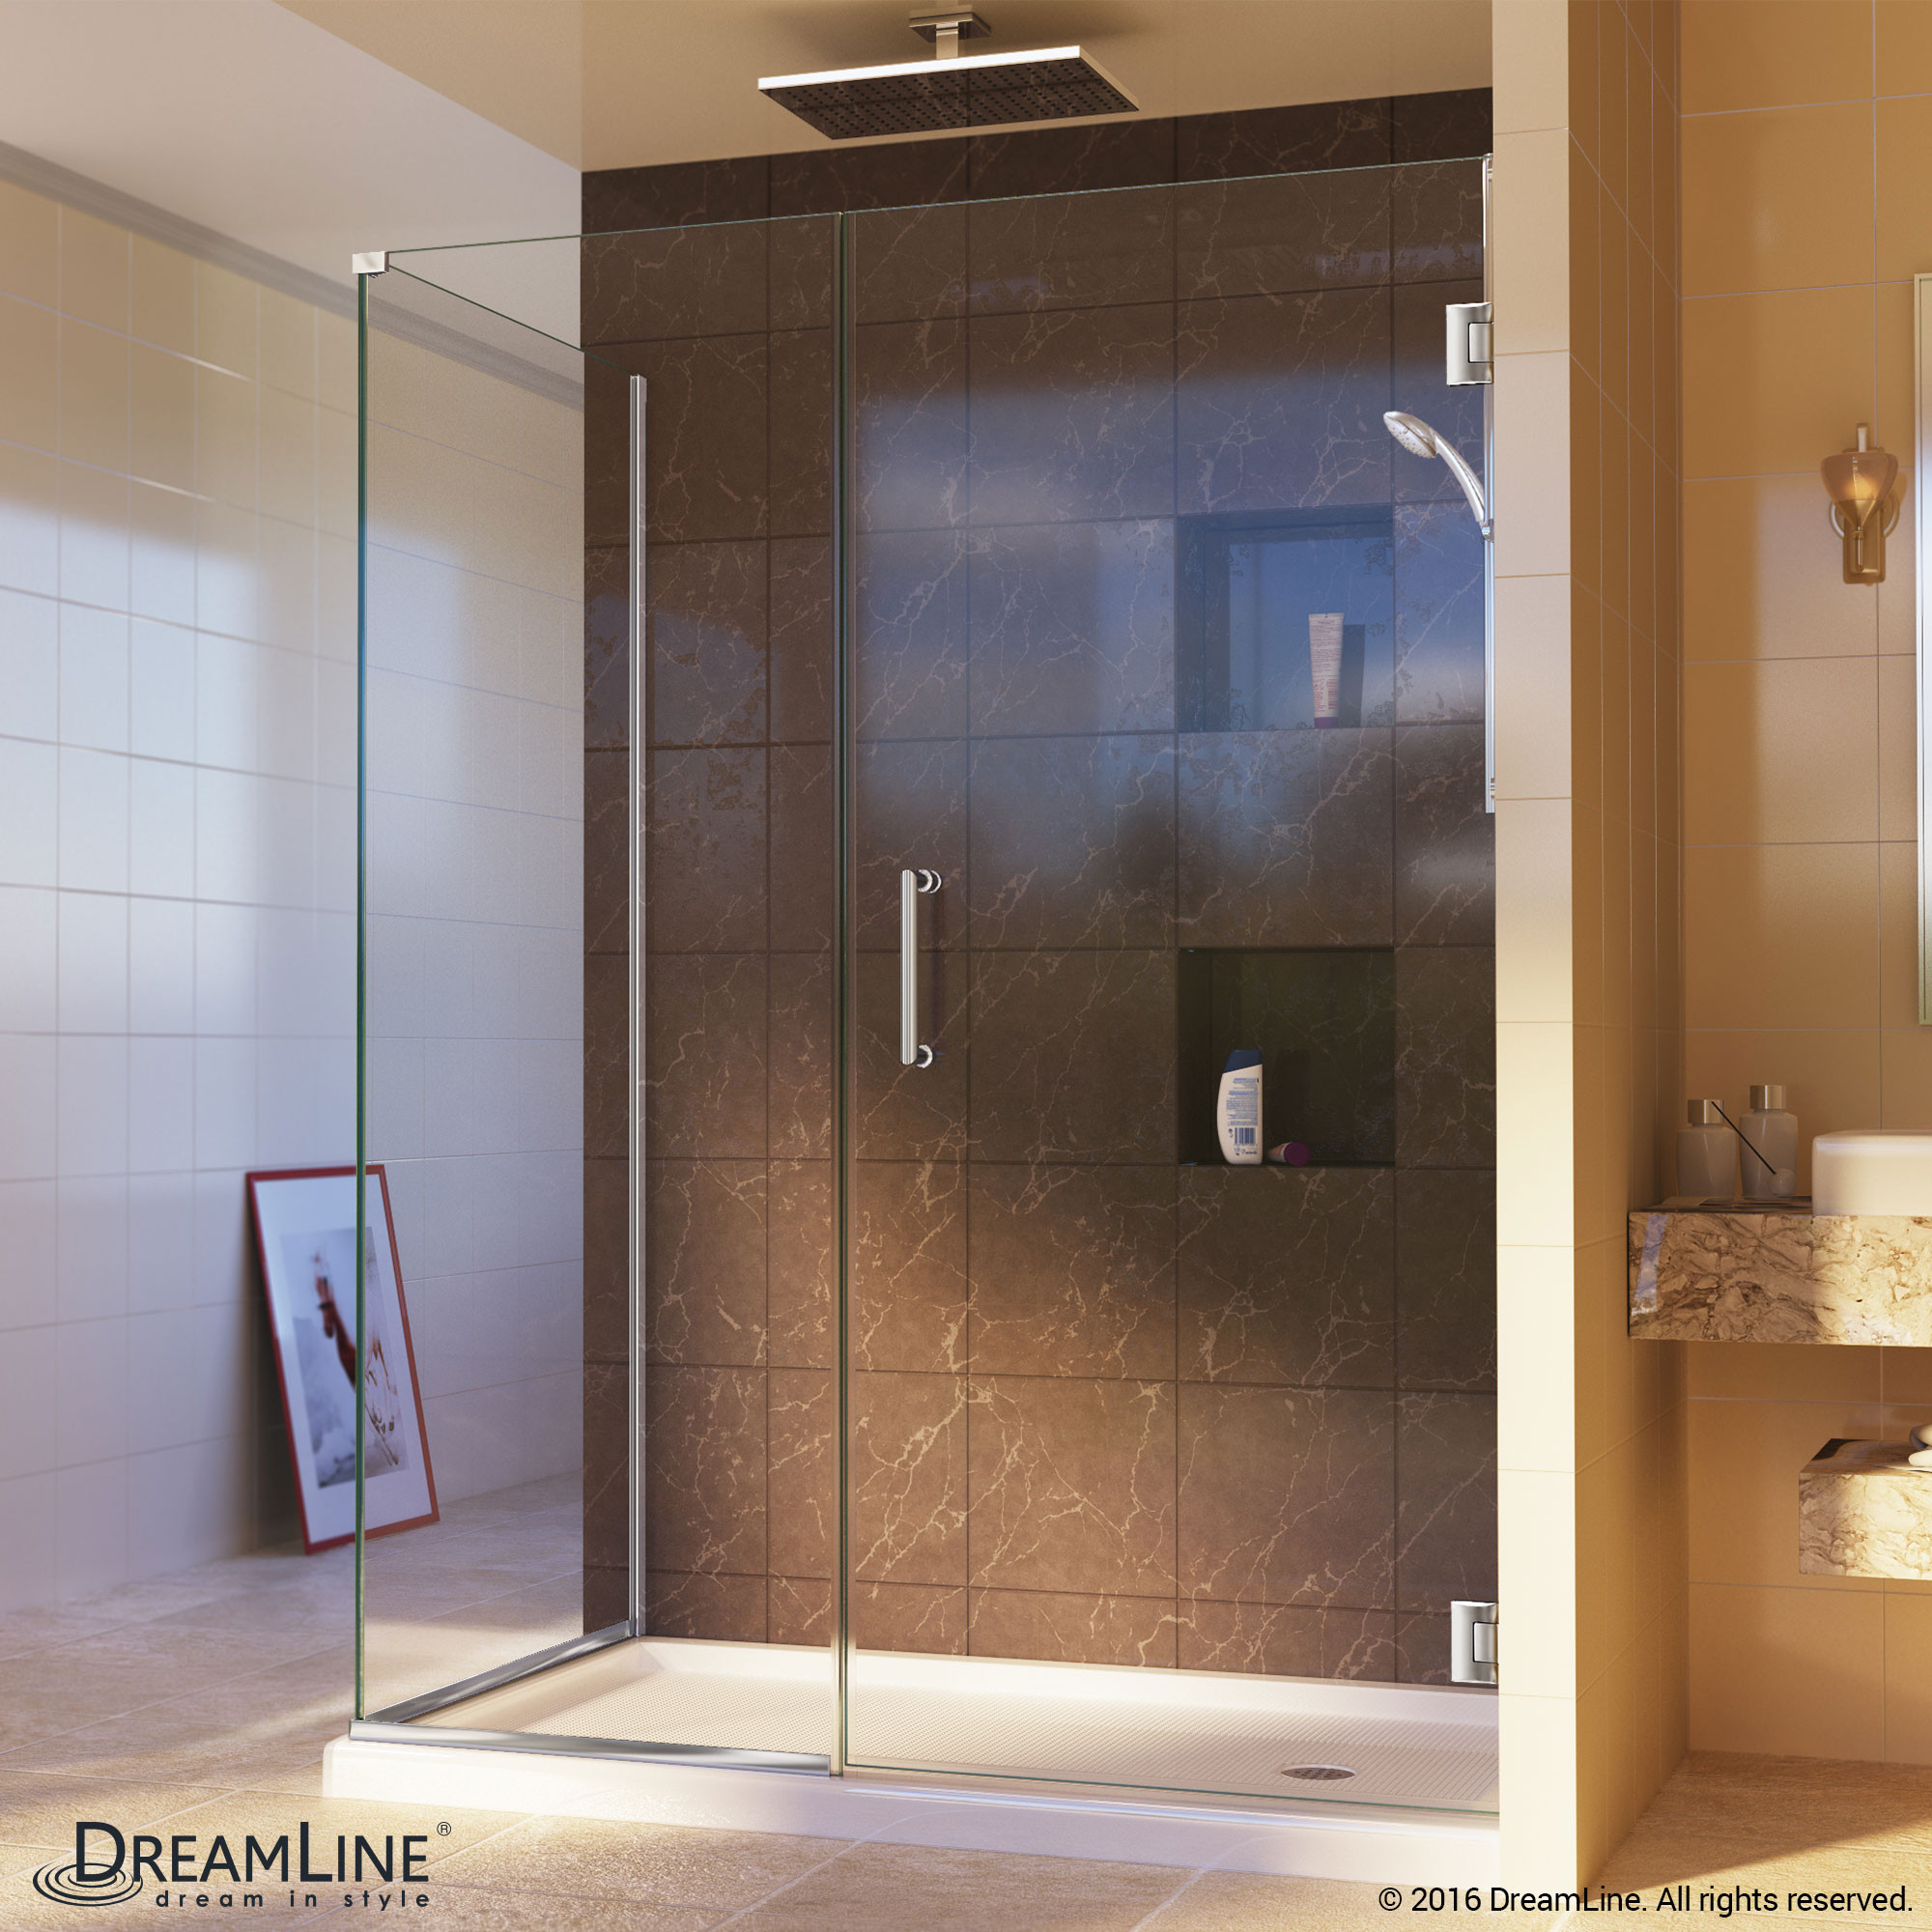 DreamLine SHEN-24510300-01 Unidoor Plus Hinged Shower Enclosure In Chrome Finish Hardware